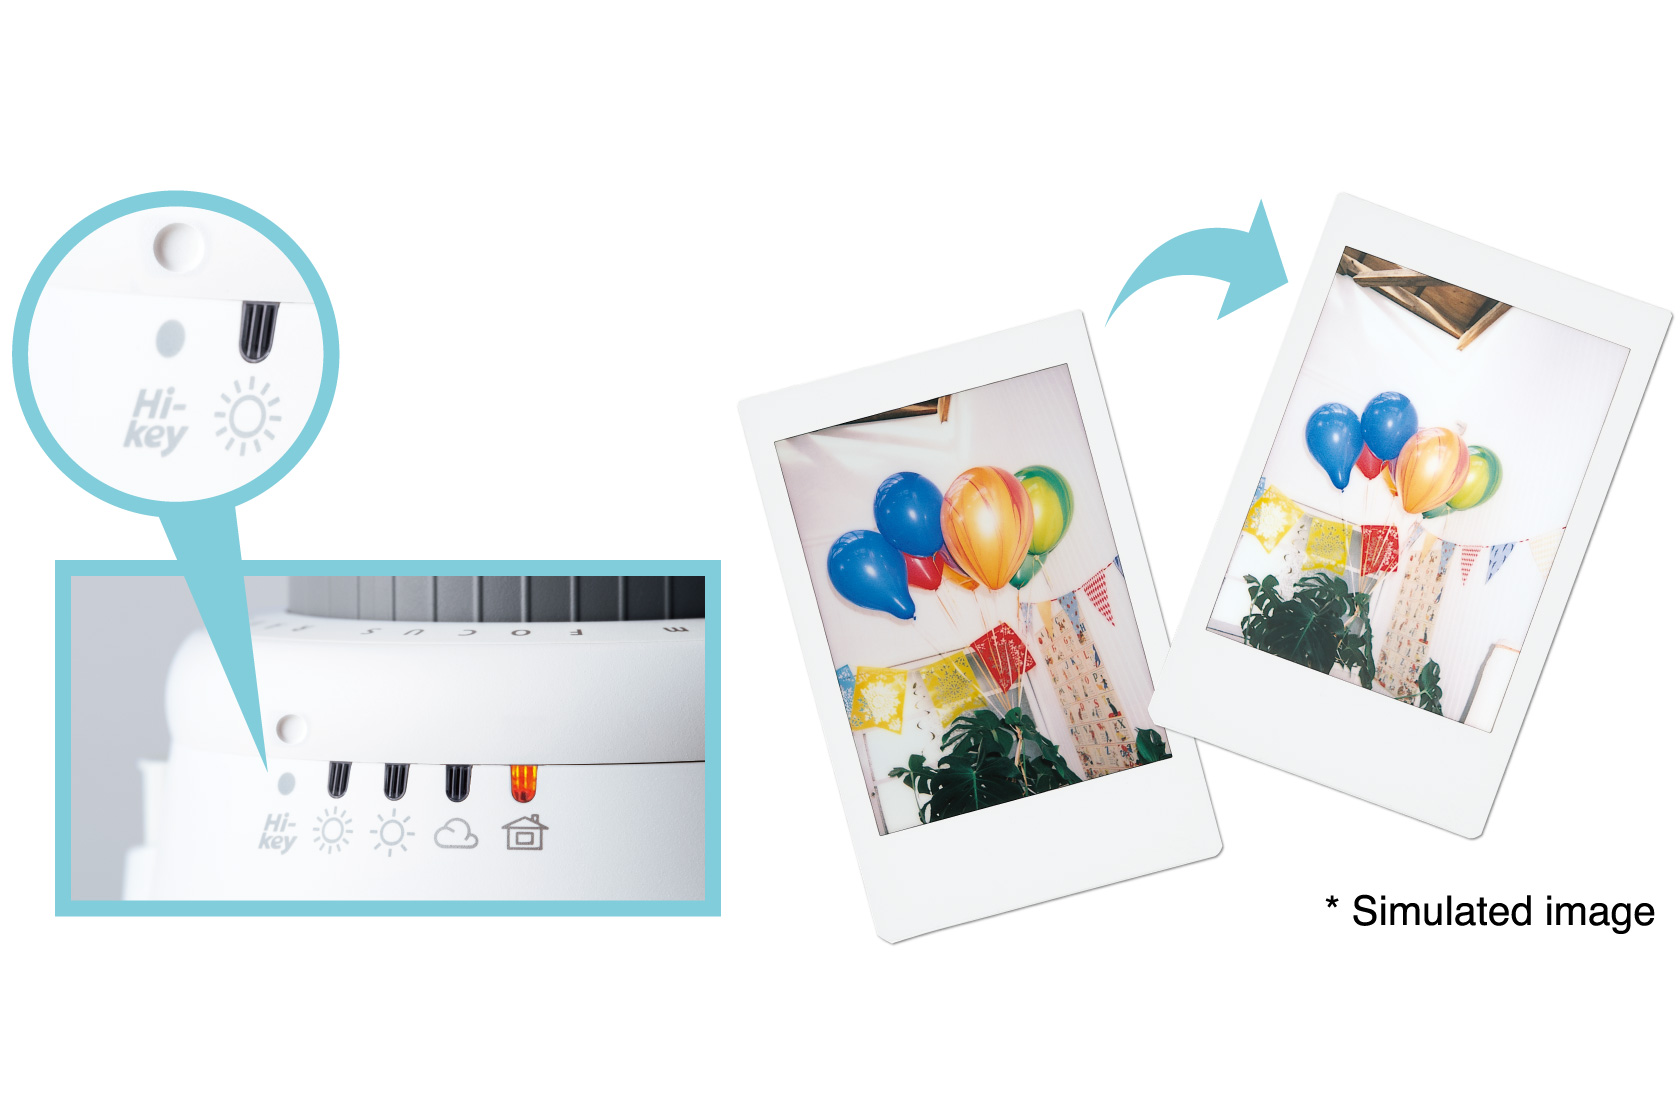 [photo] Highlight of the Instax Mini 9's Hi-Key adjustment dial and sample photos